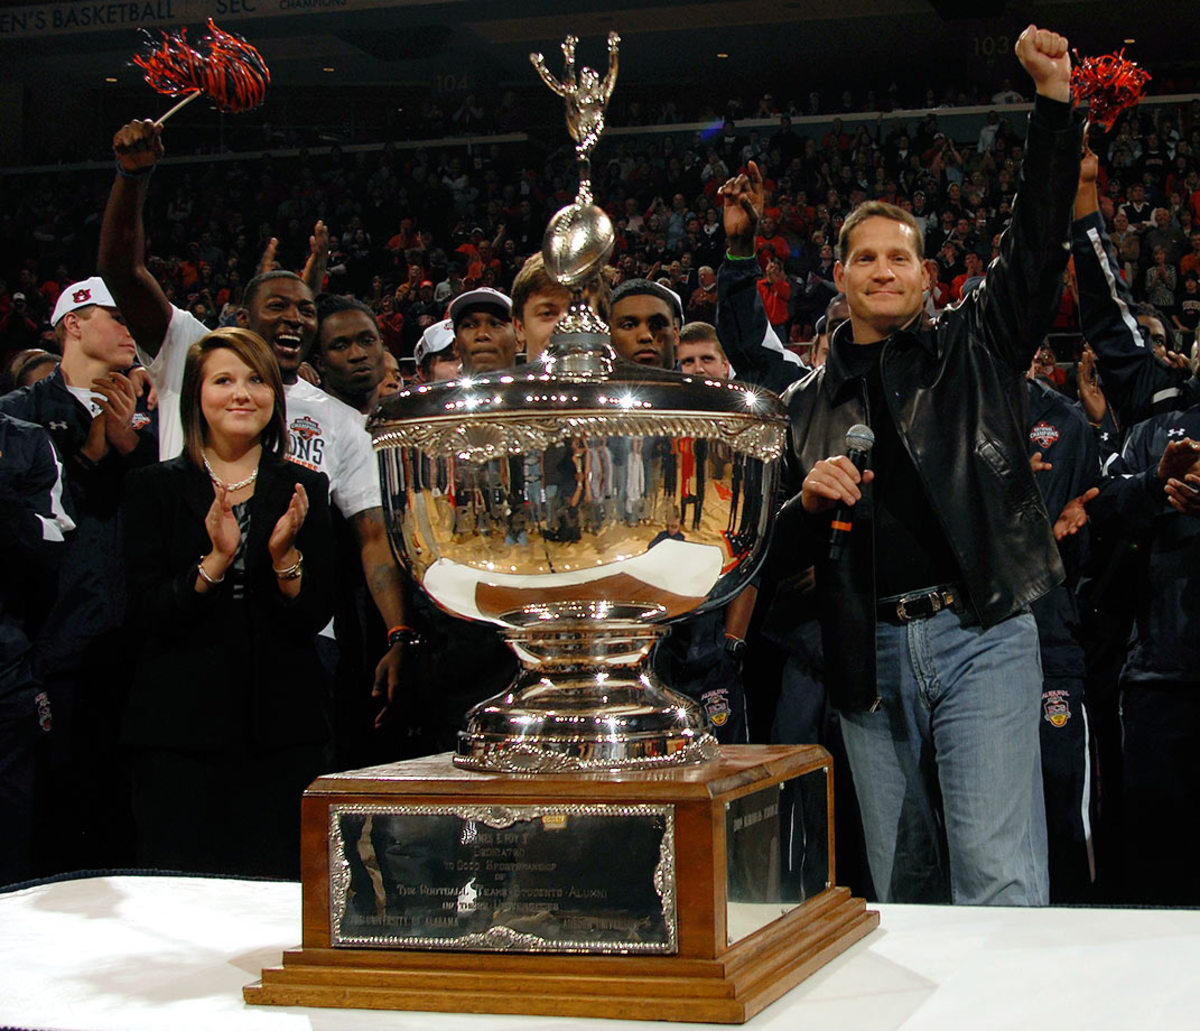 Foy-ODK-Sportsmanship-Trophy-Auburn-Alabama-Gen-Chizik.jpg